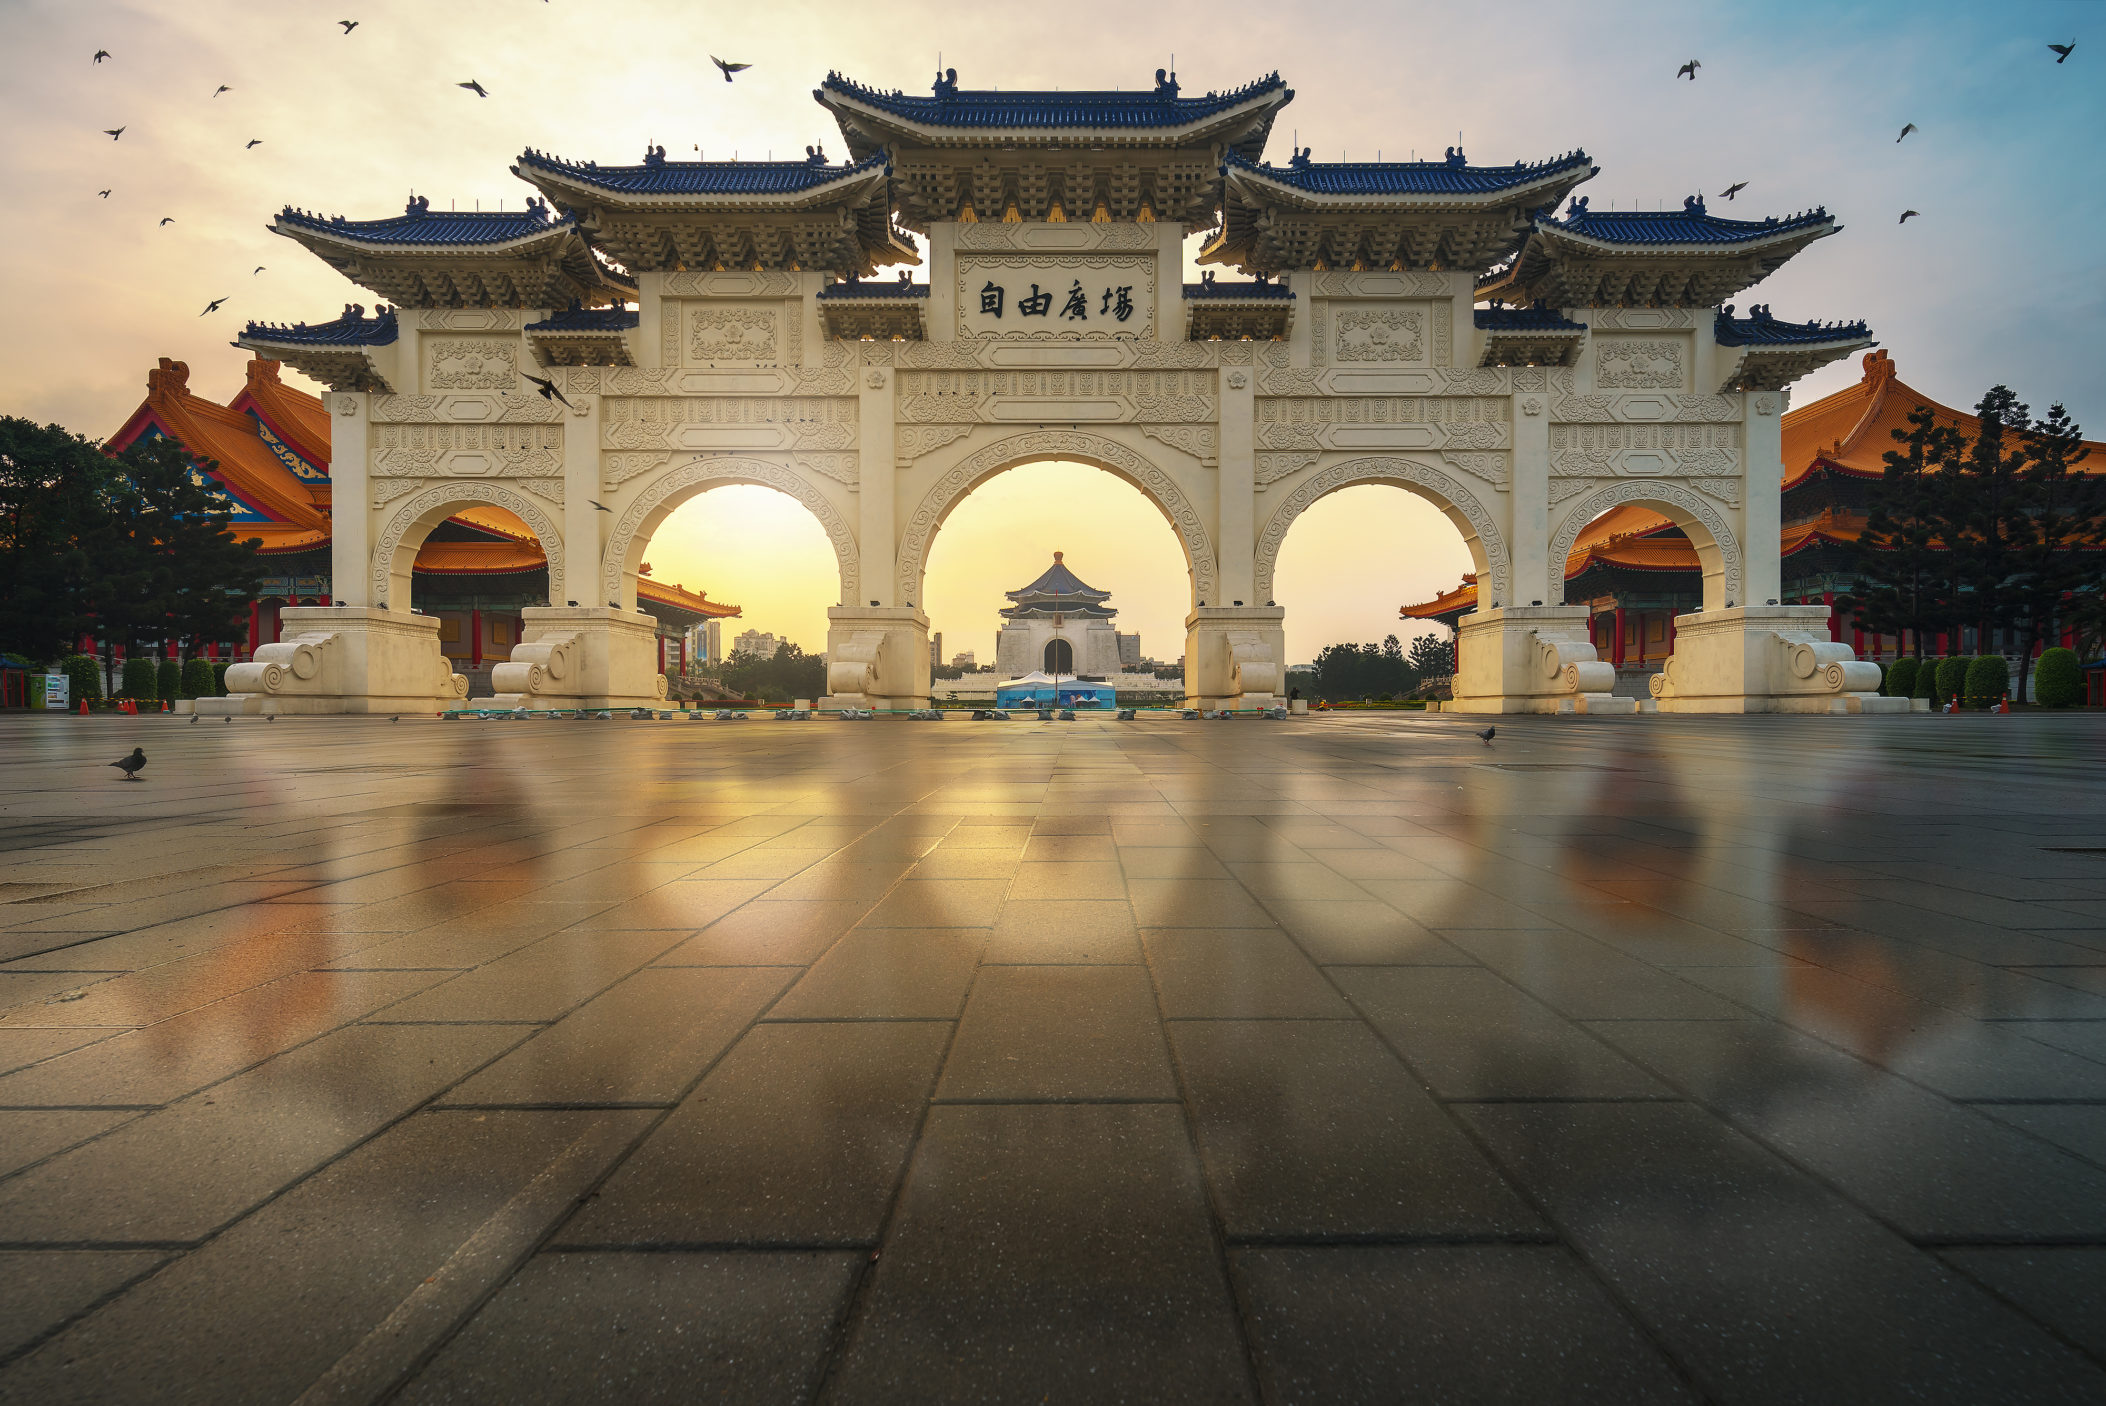 Taiwan [Shutterstock]